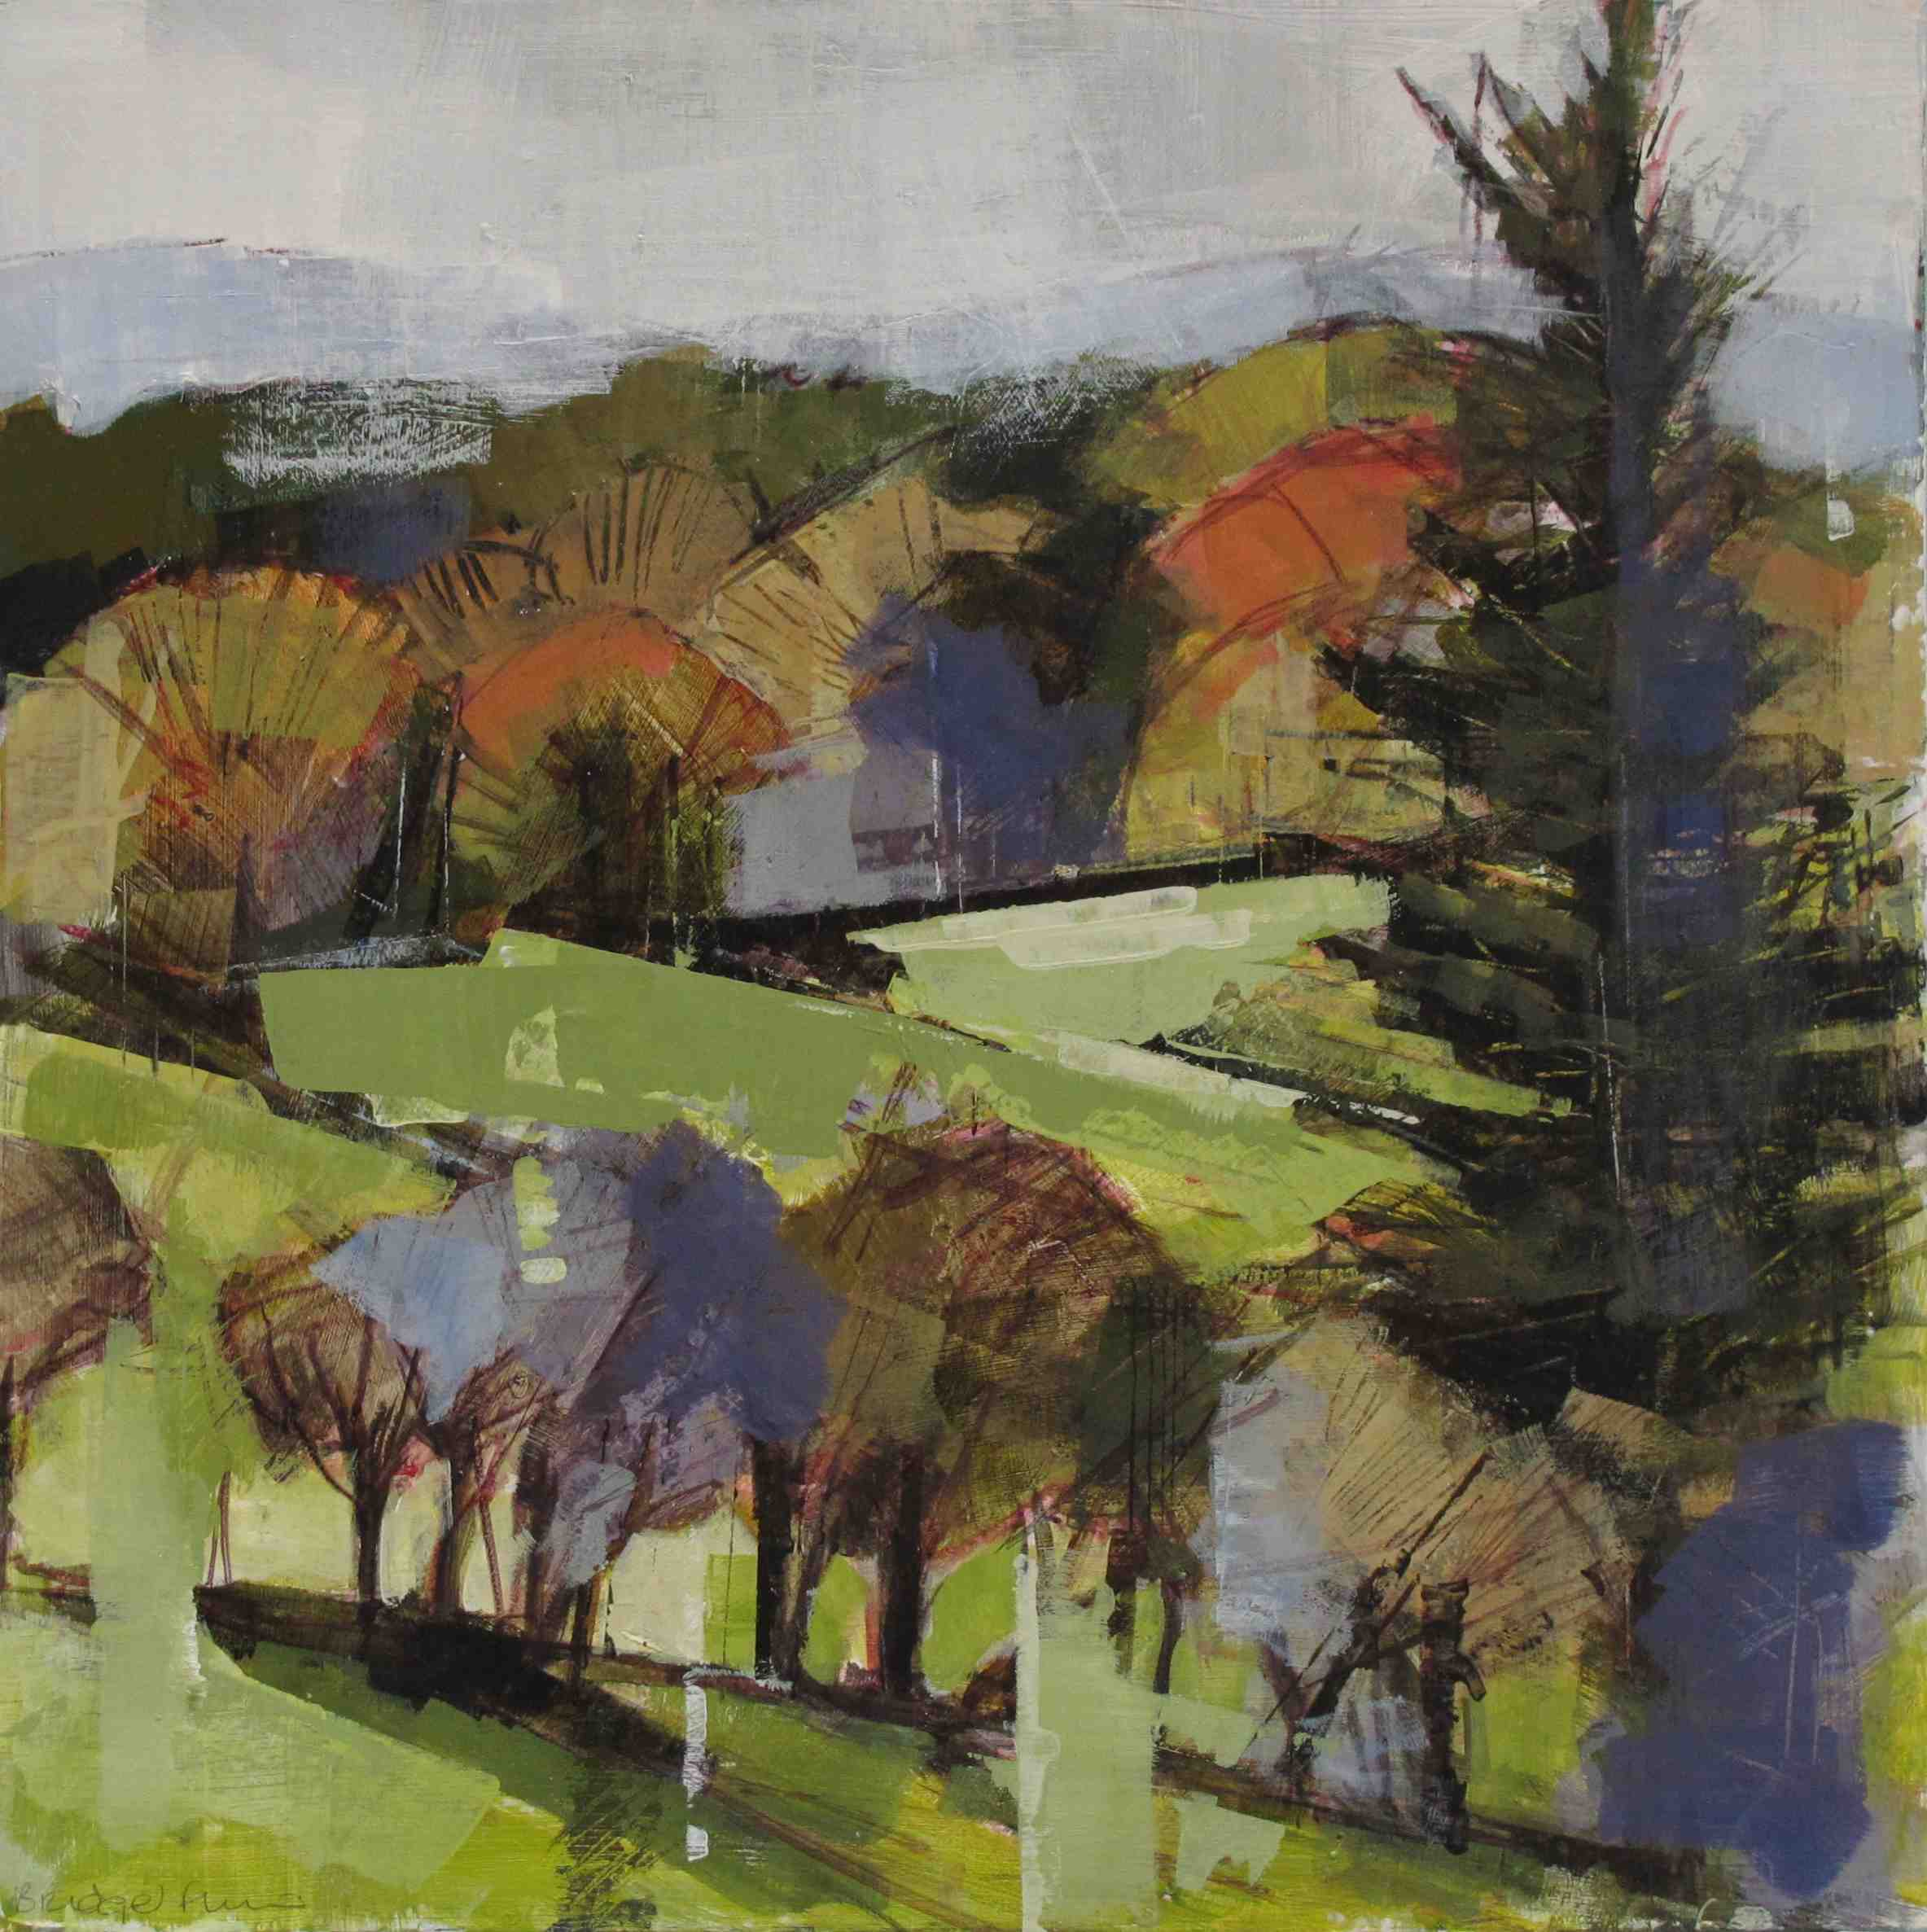 Bridget Flinn, Wicklow Autumn Colour, acrylic on paper, 38 x 38 cm